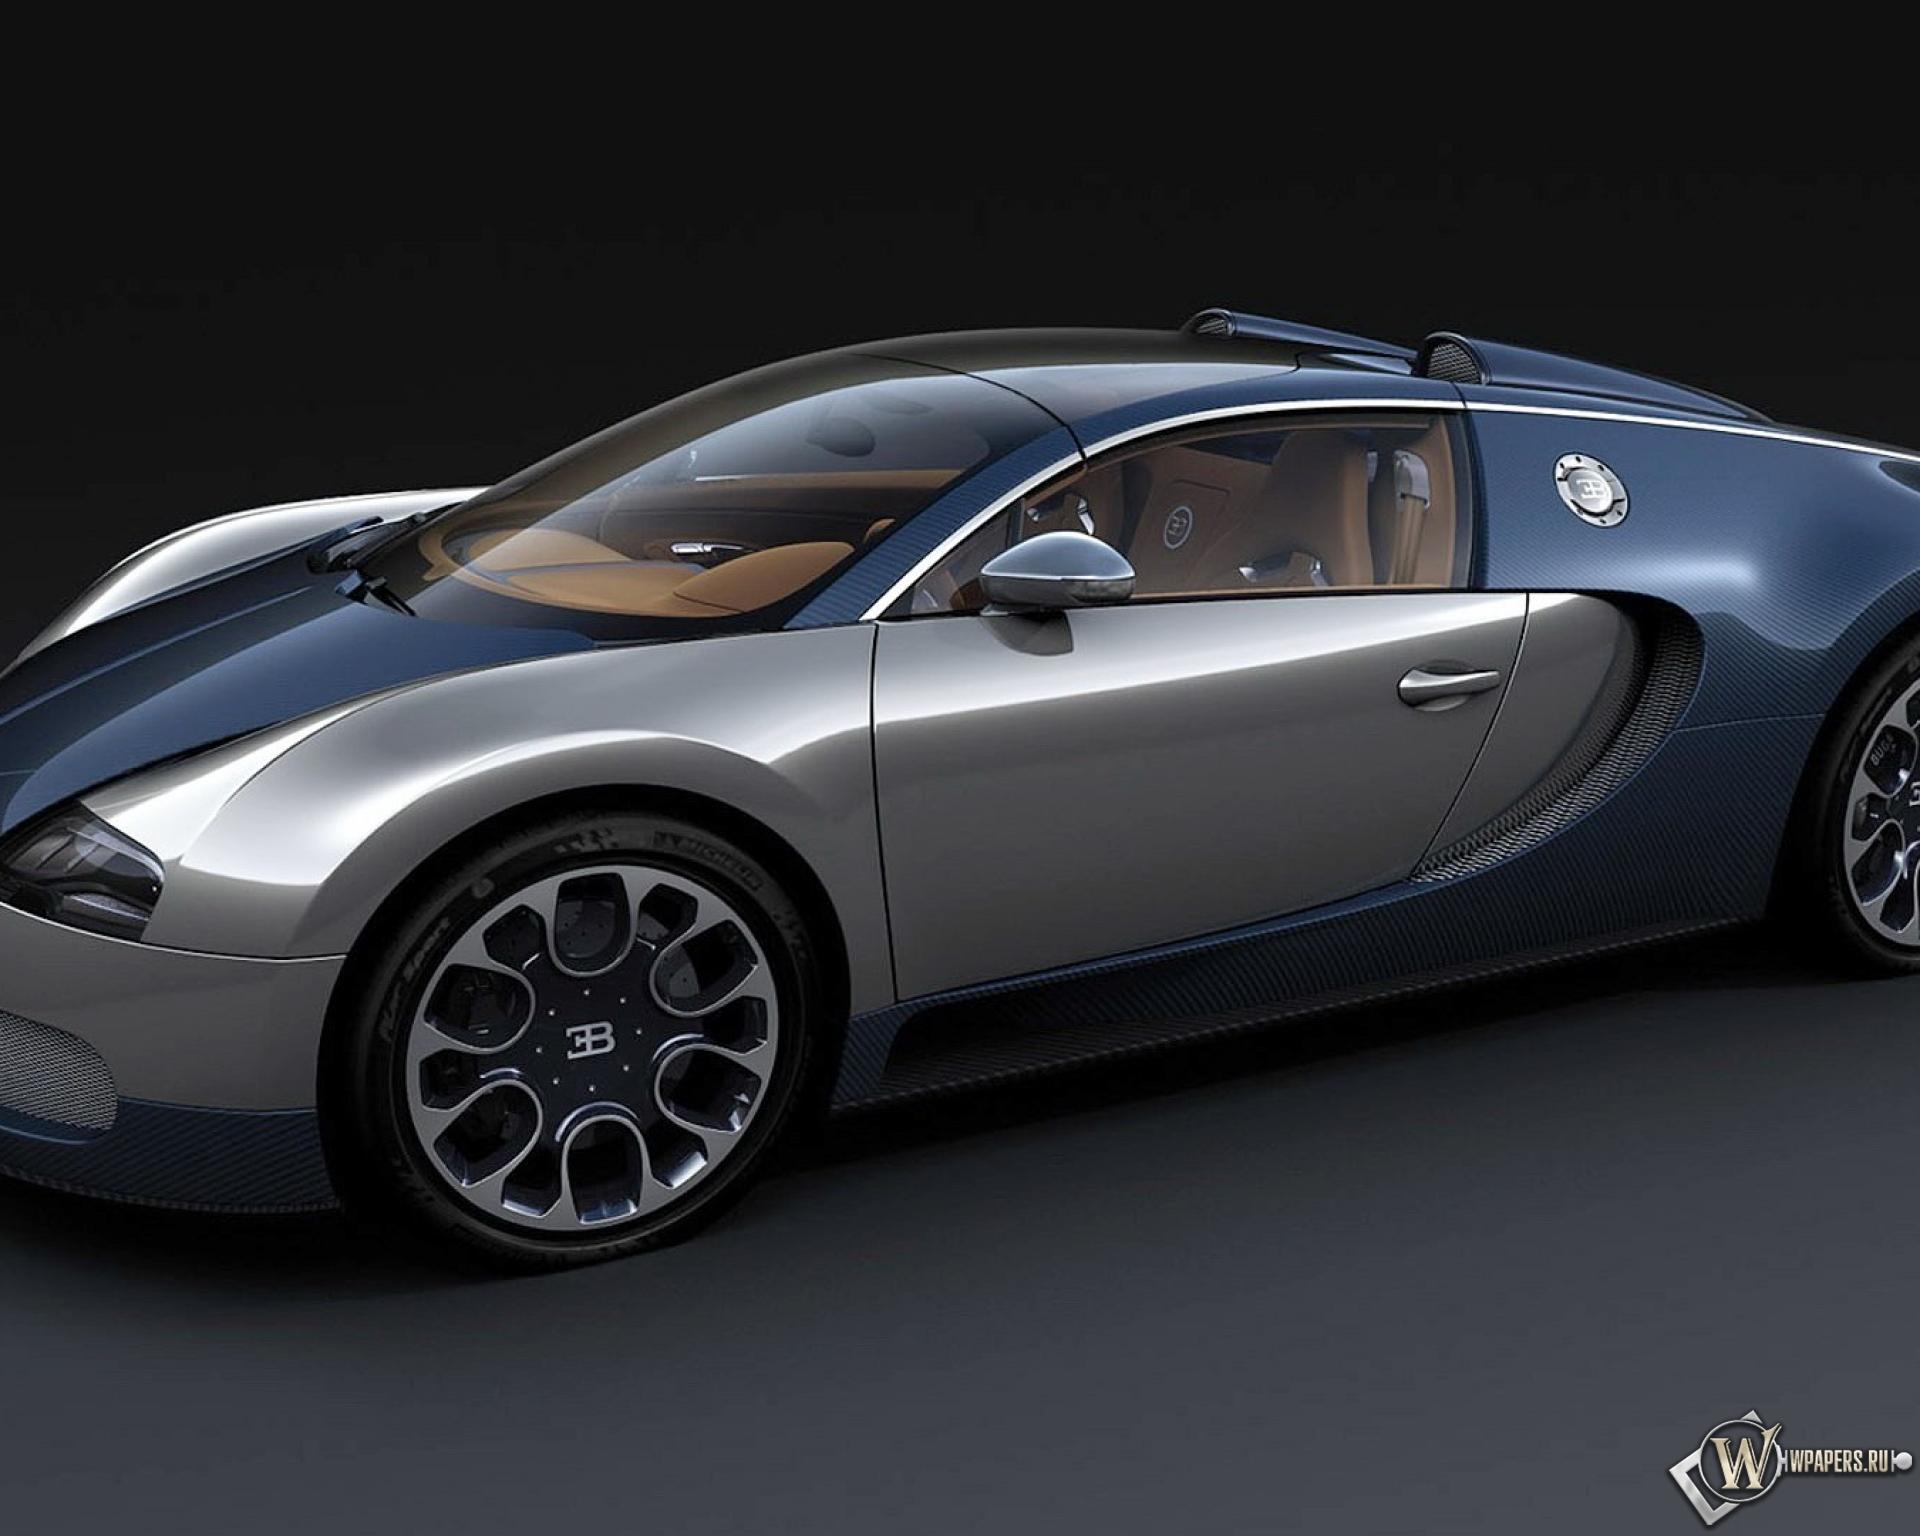 bugatti veyron bugatti veyron 1920 1536 5 4. Black Bedroom Furniture Sets. Home Design Ideas